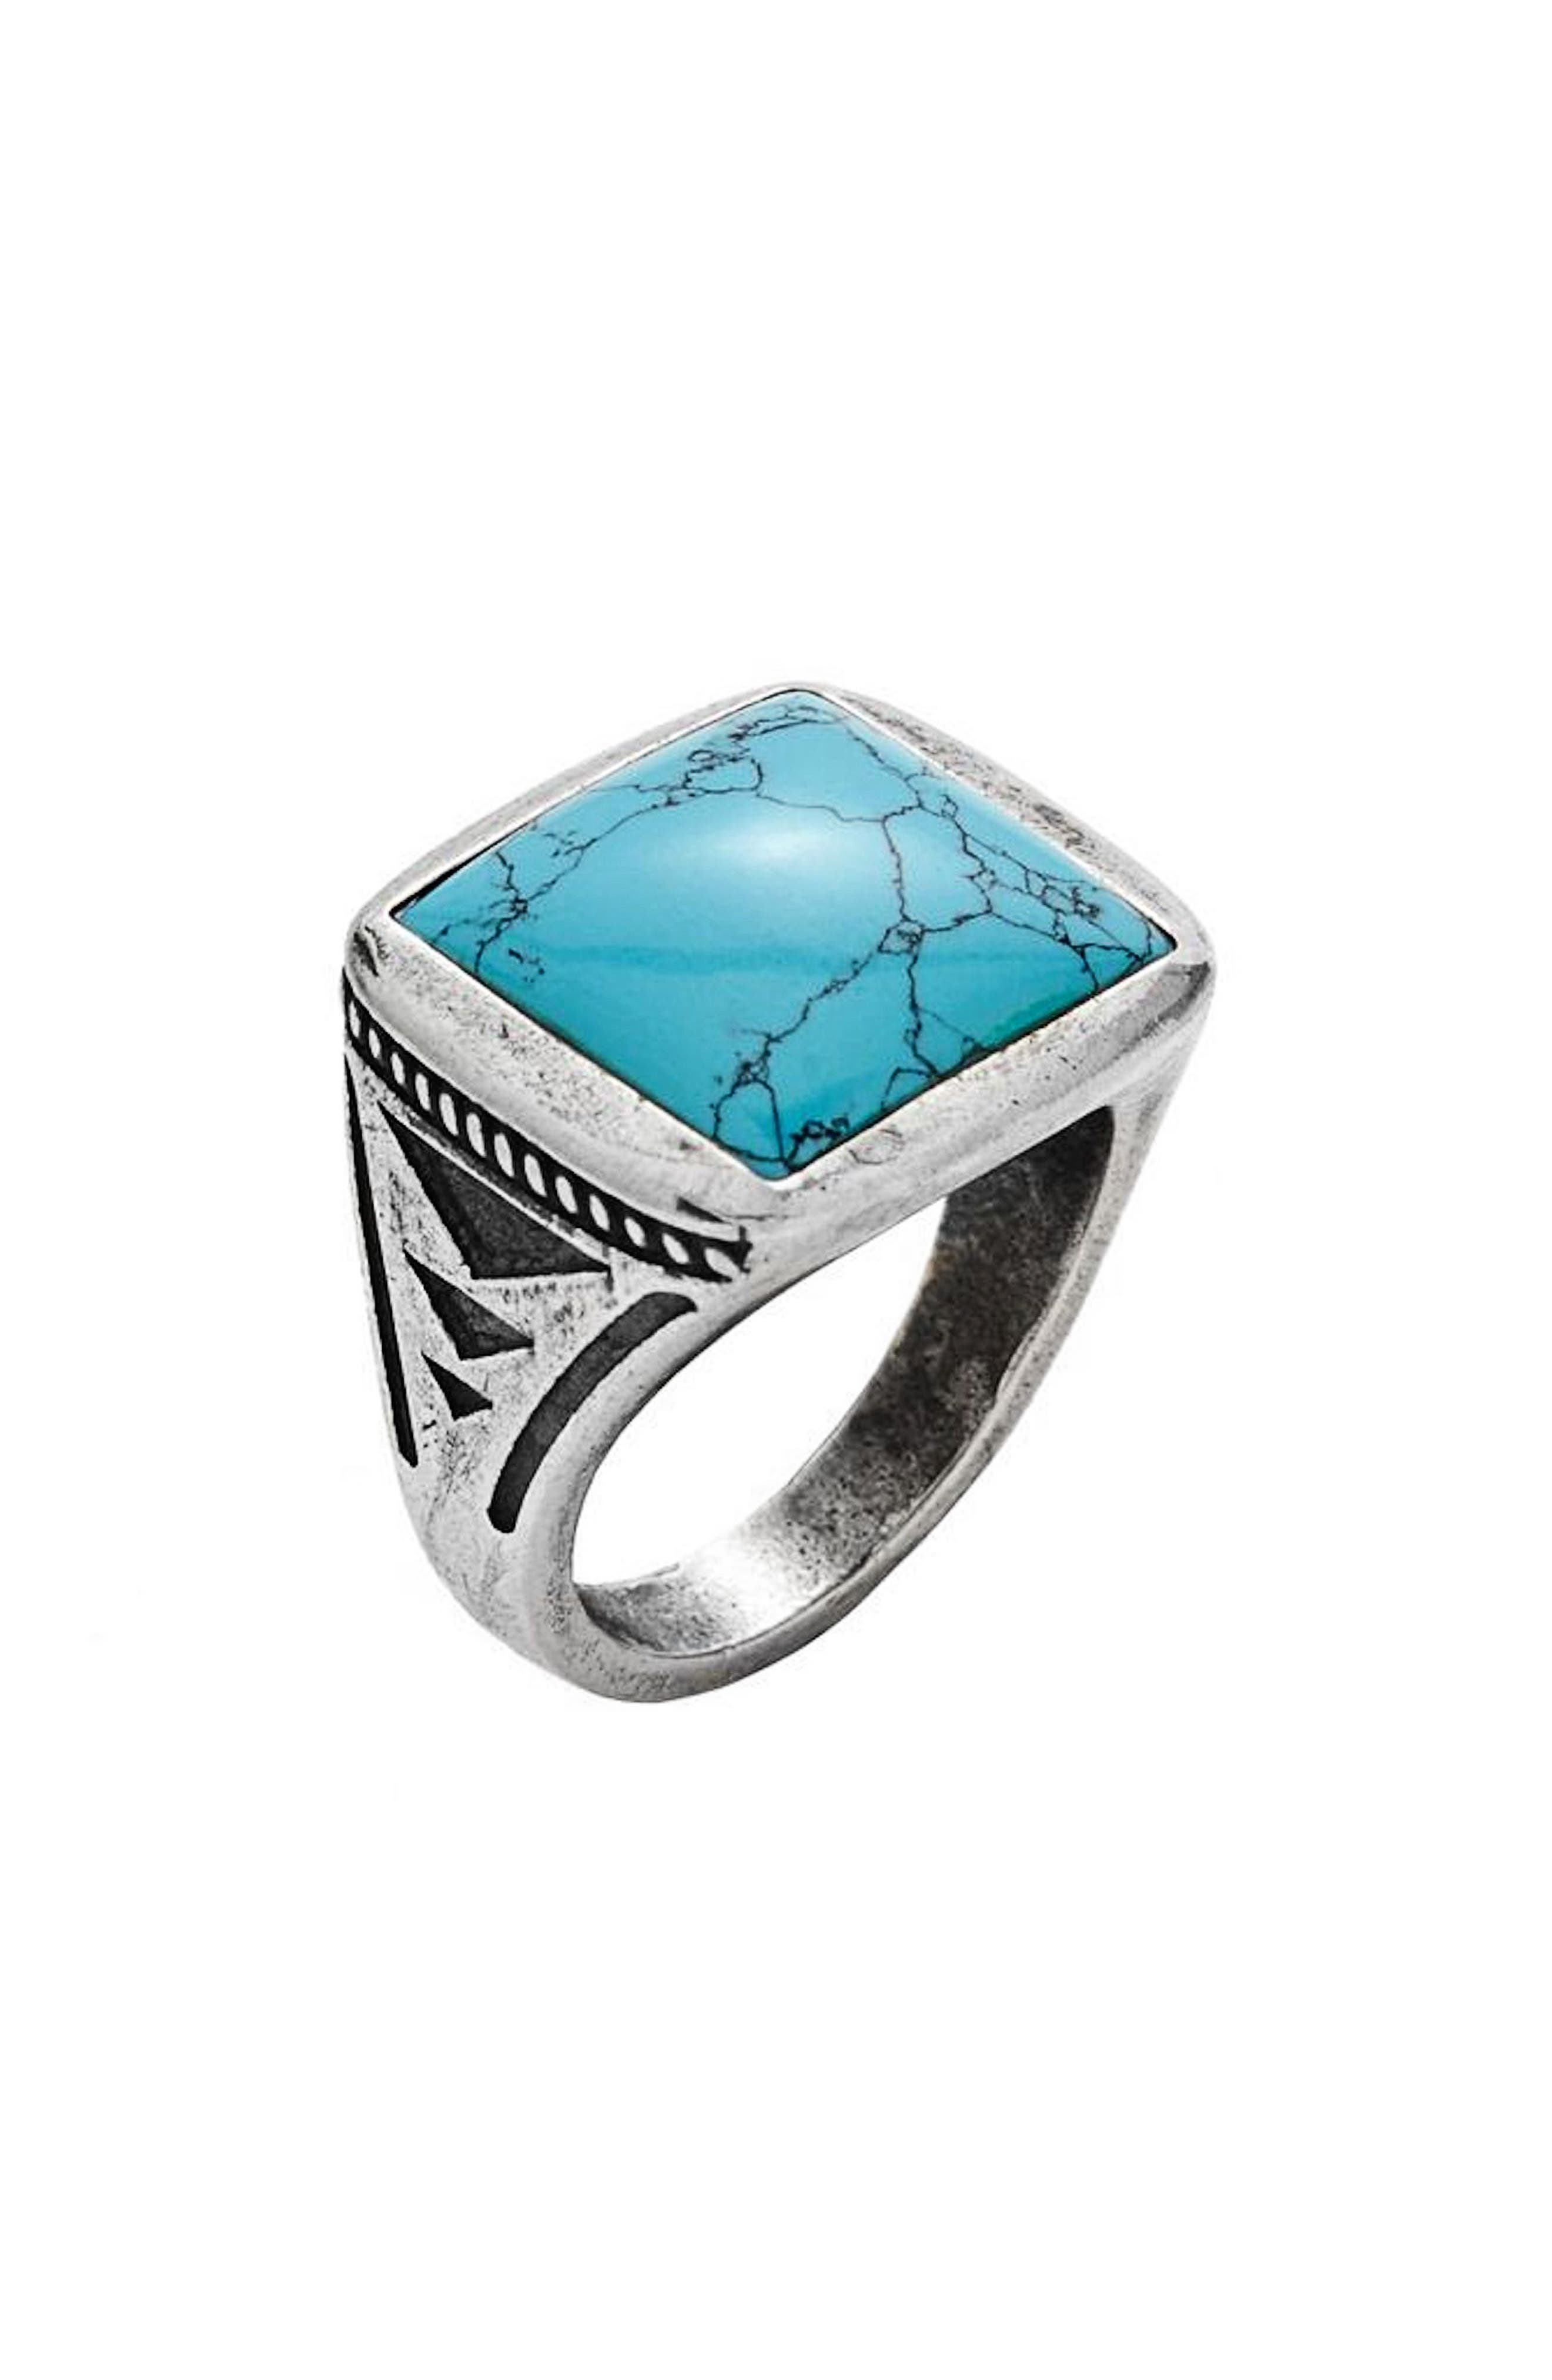 Main Image - Degs & Sal Turquoise Ring